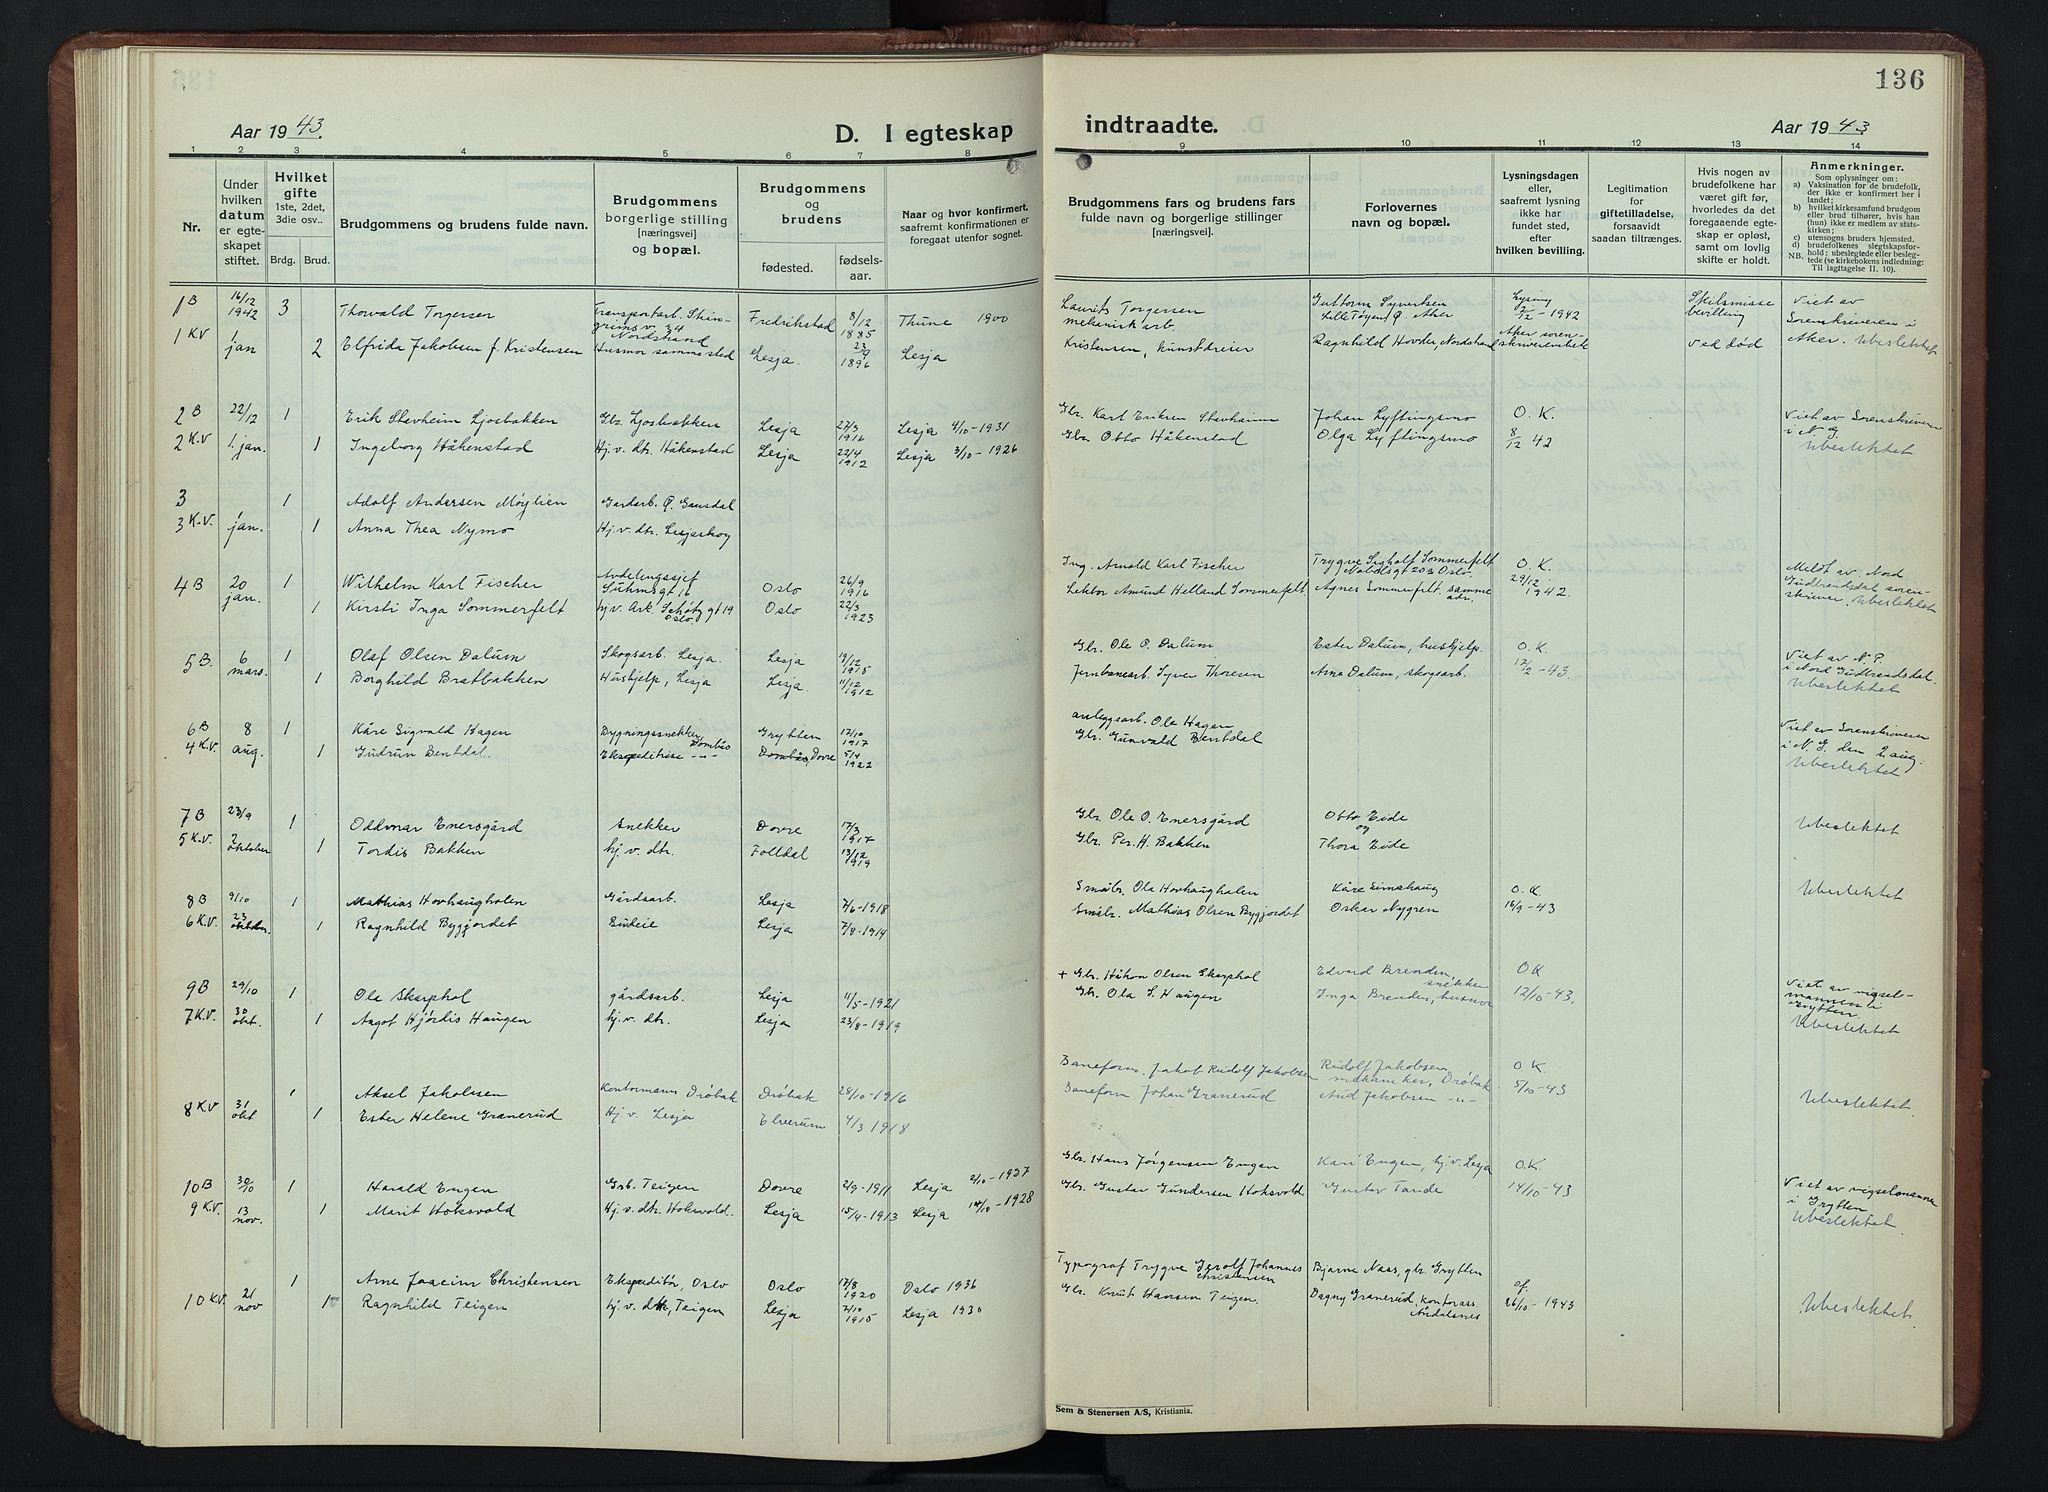 SAH, Lesja prestekontor, Klokkerbok nr. 9, 1924-1947, s. 136